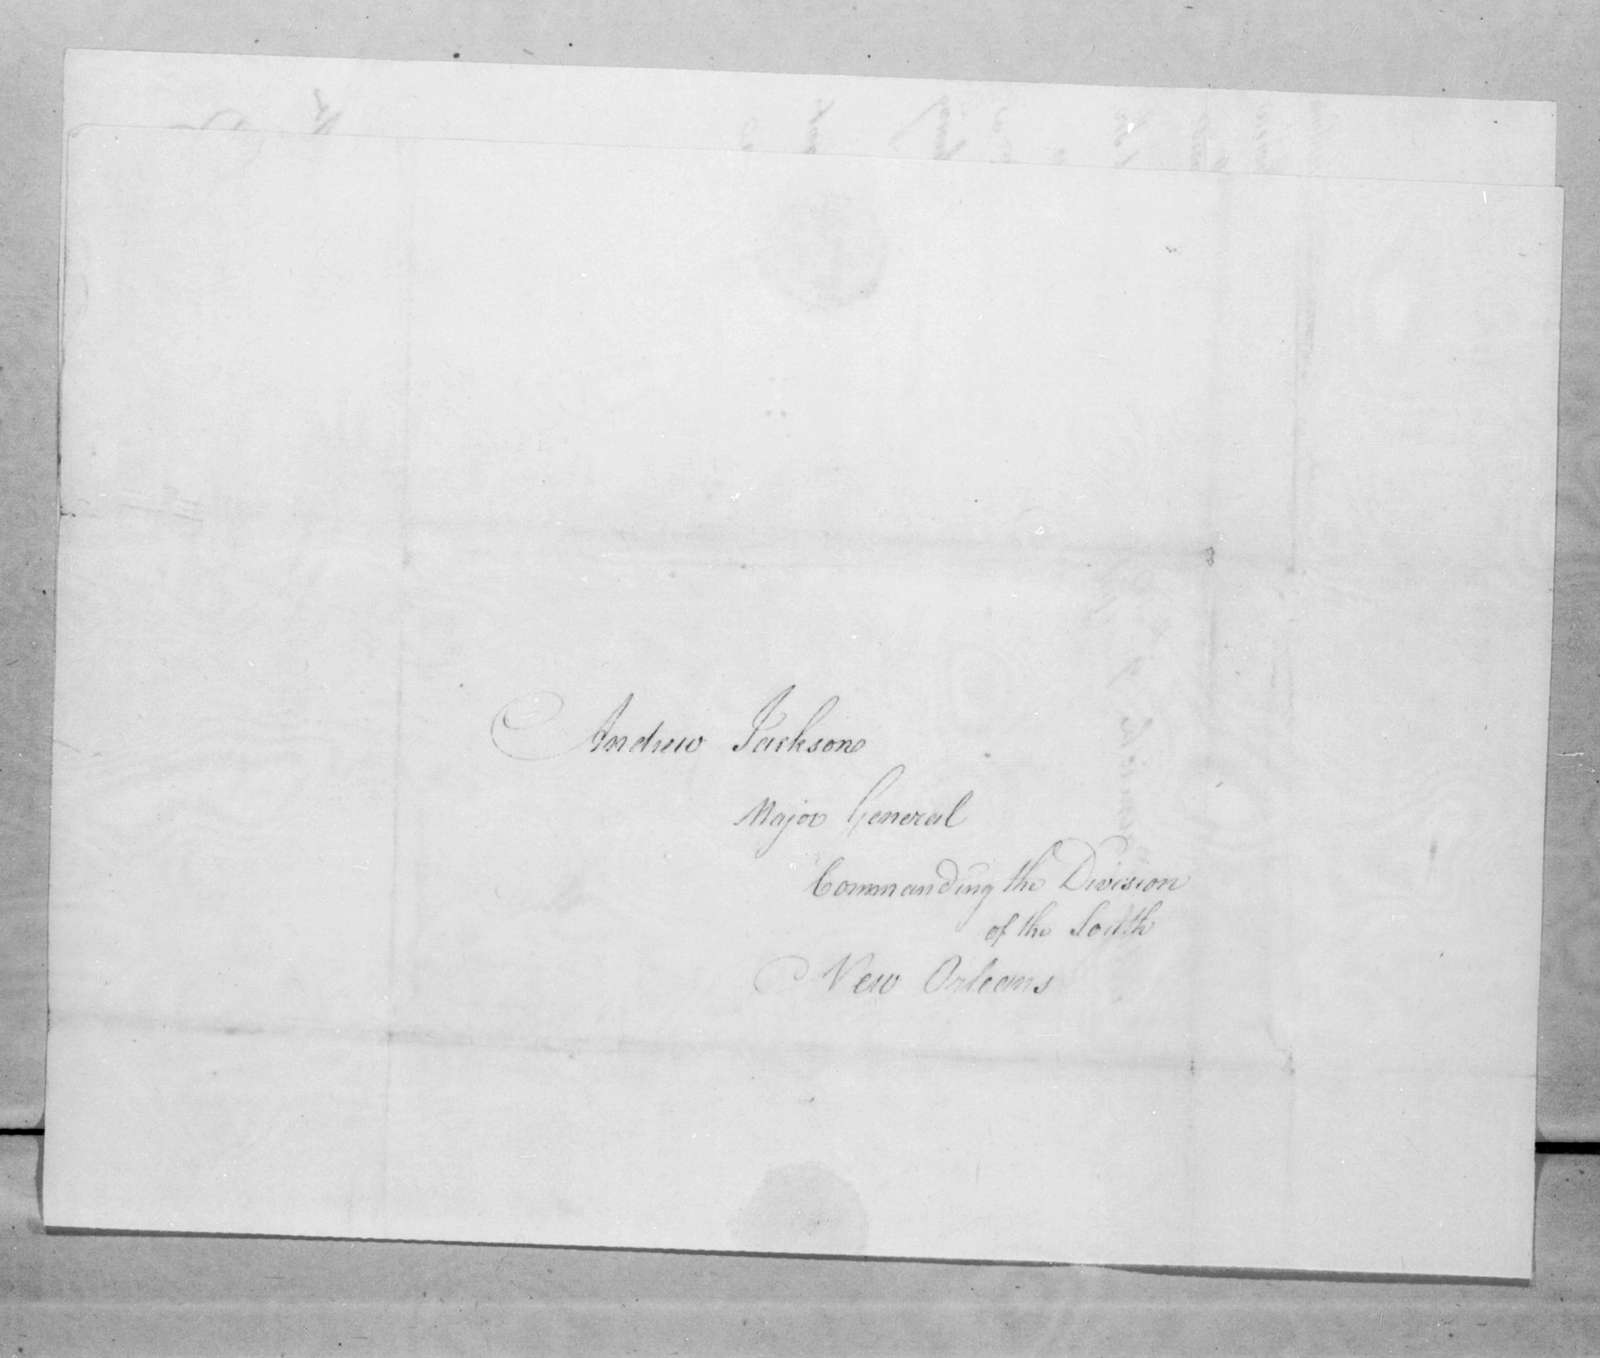 Daniel Carmick to Andrew Jackson, April 7, 1816